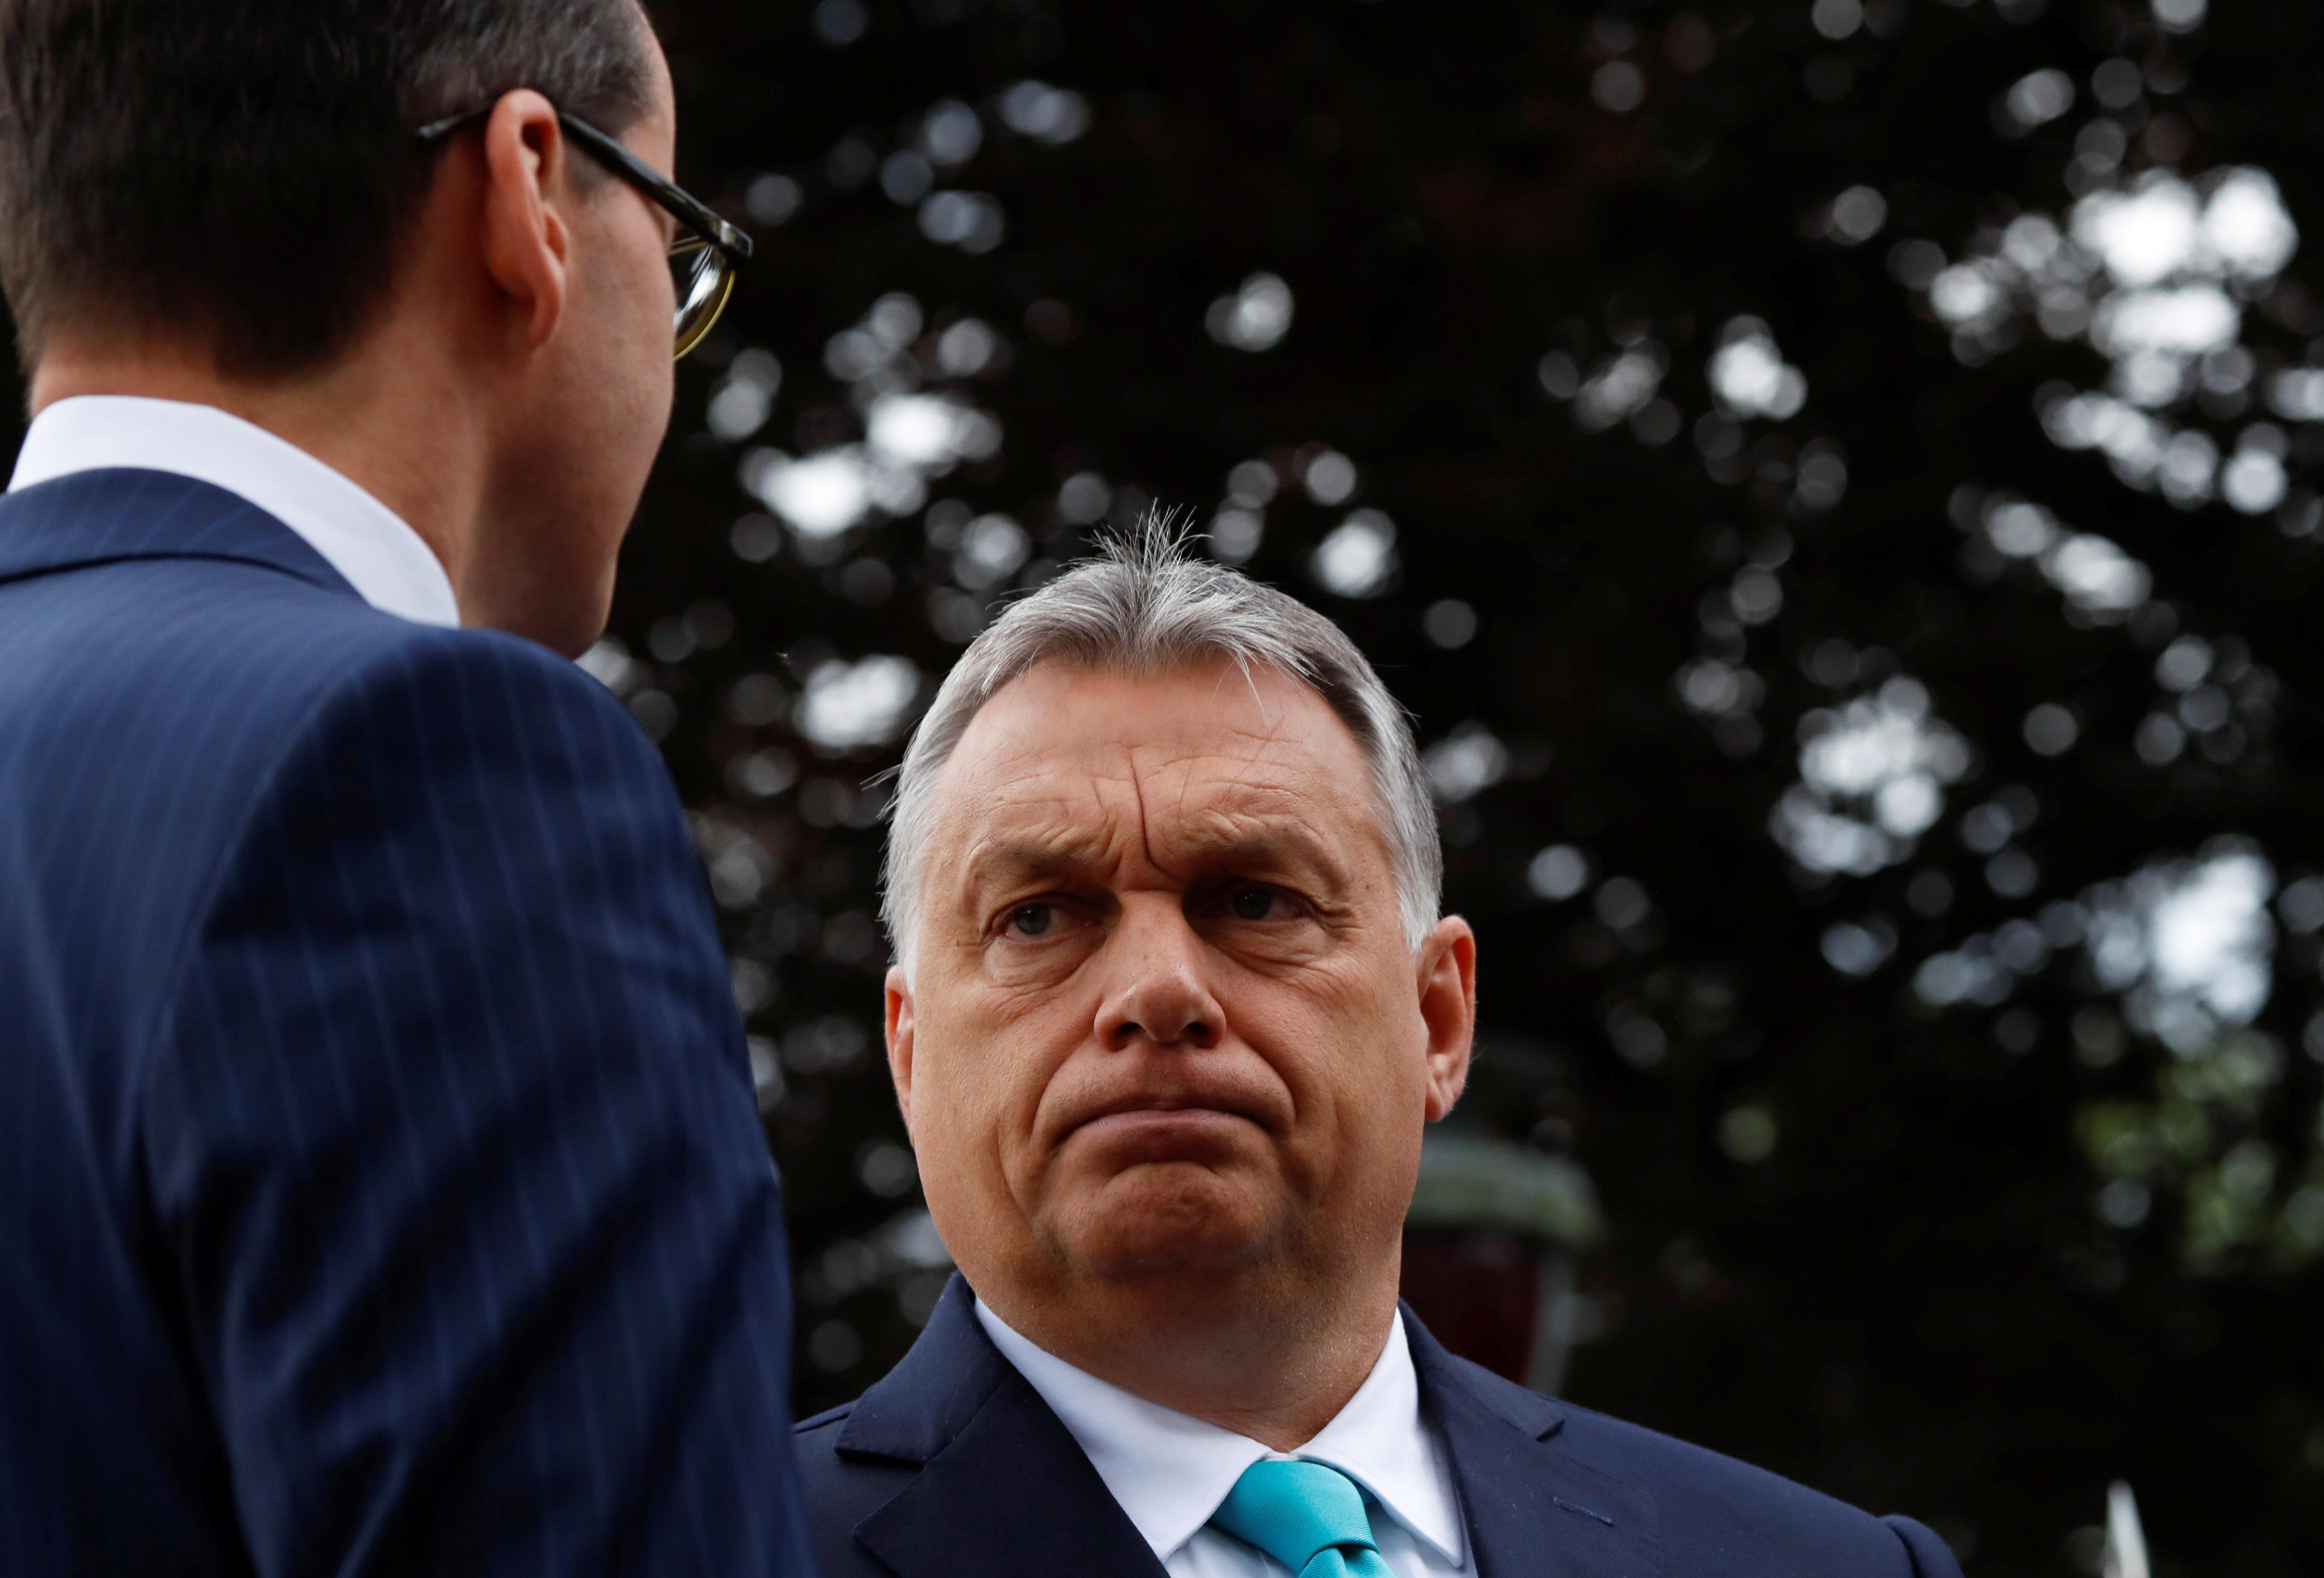 SZ: Ο ούγγρος πρωθυπουργός καλεί τους εθνικιστές να μην ενδώσουν στις ξένες πιέσεις μέσω μιας ήδη υφιστάμενης κρίσης μεταξύ